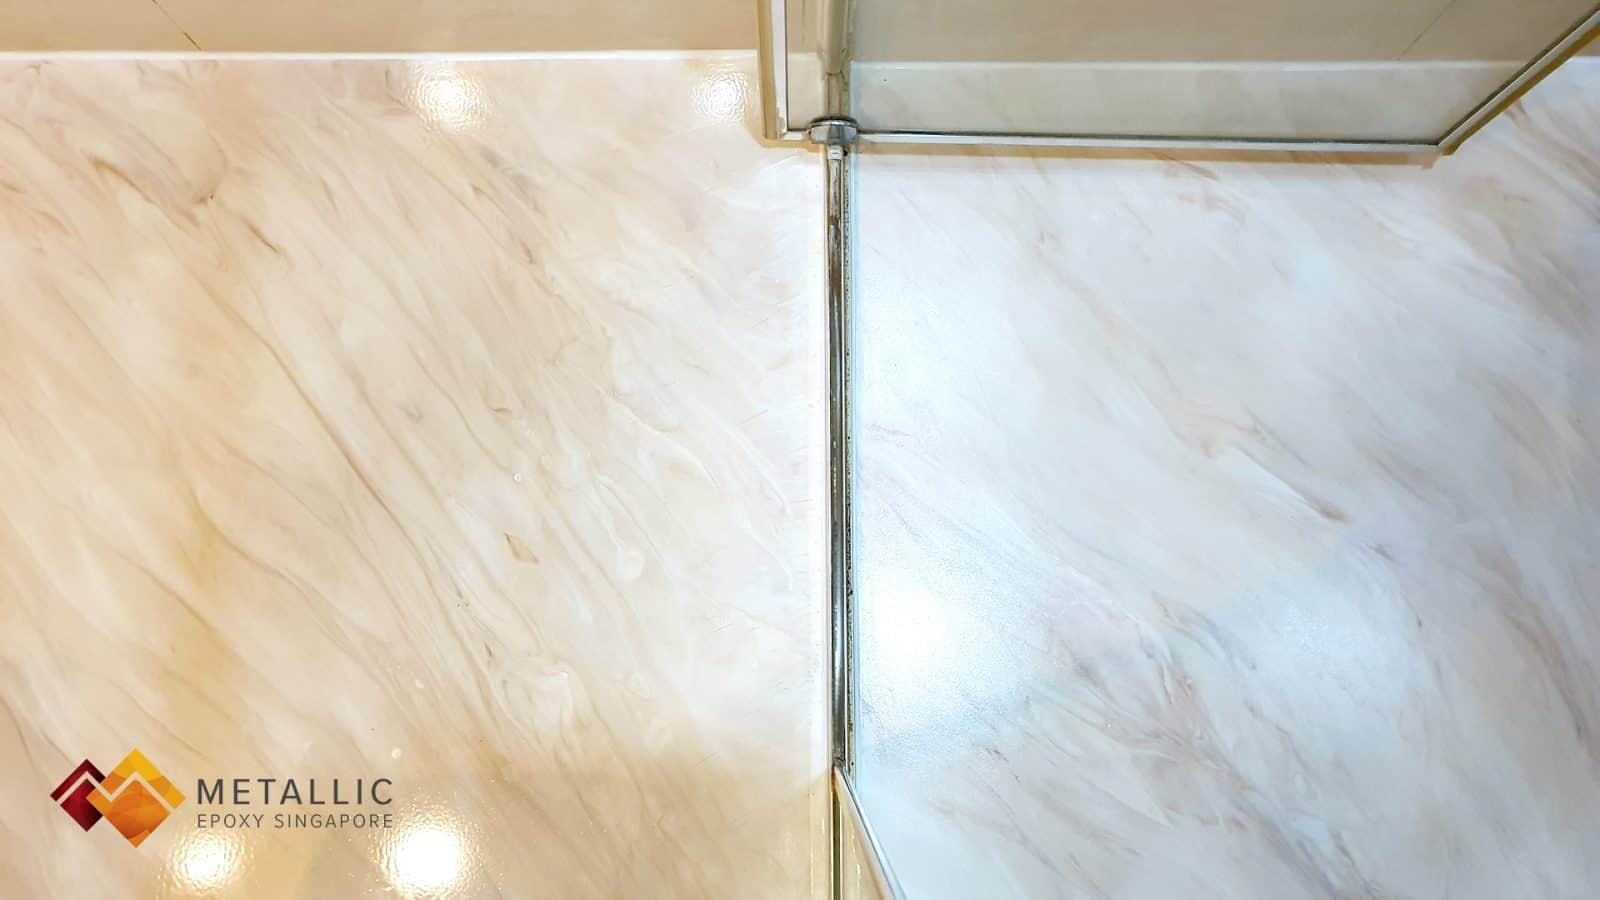 Metallic Epoxy Singapore Burdur Beige Bathroom Flooring